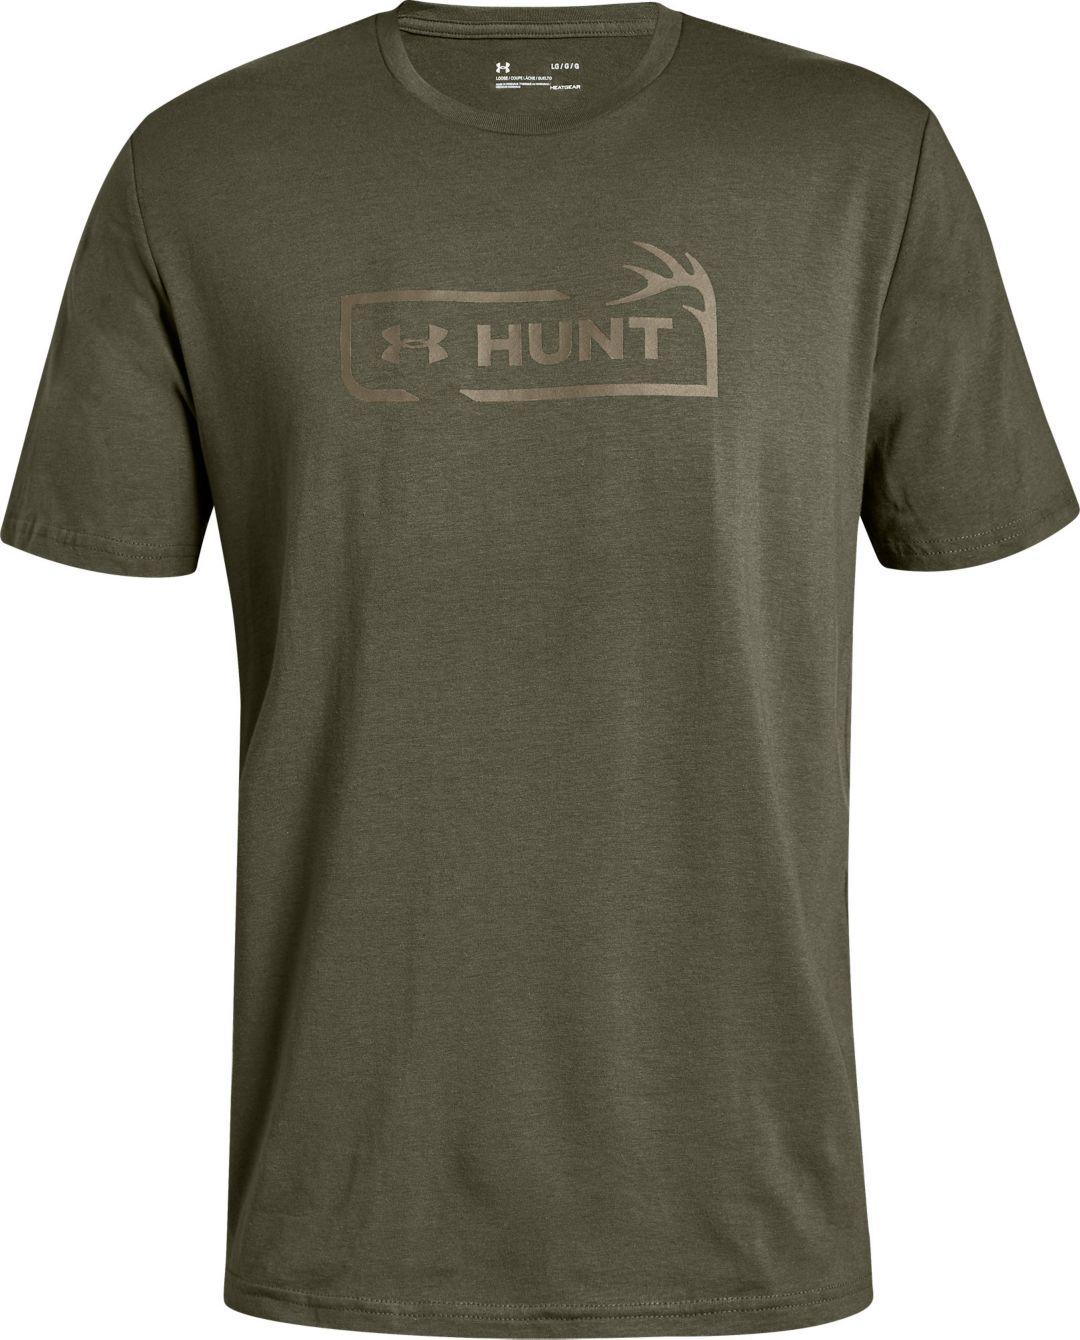 980f1b8bf Under Armour Men's Hunt Icon Short Sleeve T-Shirt. noImageFound. Previous